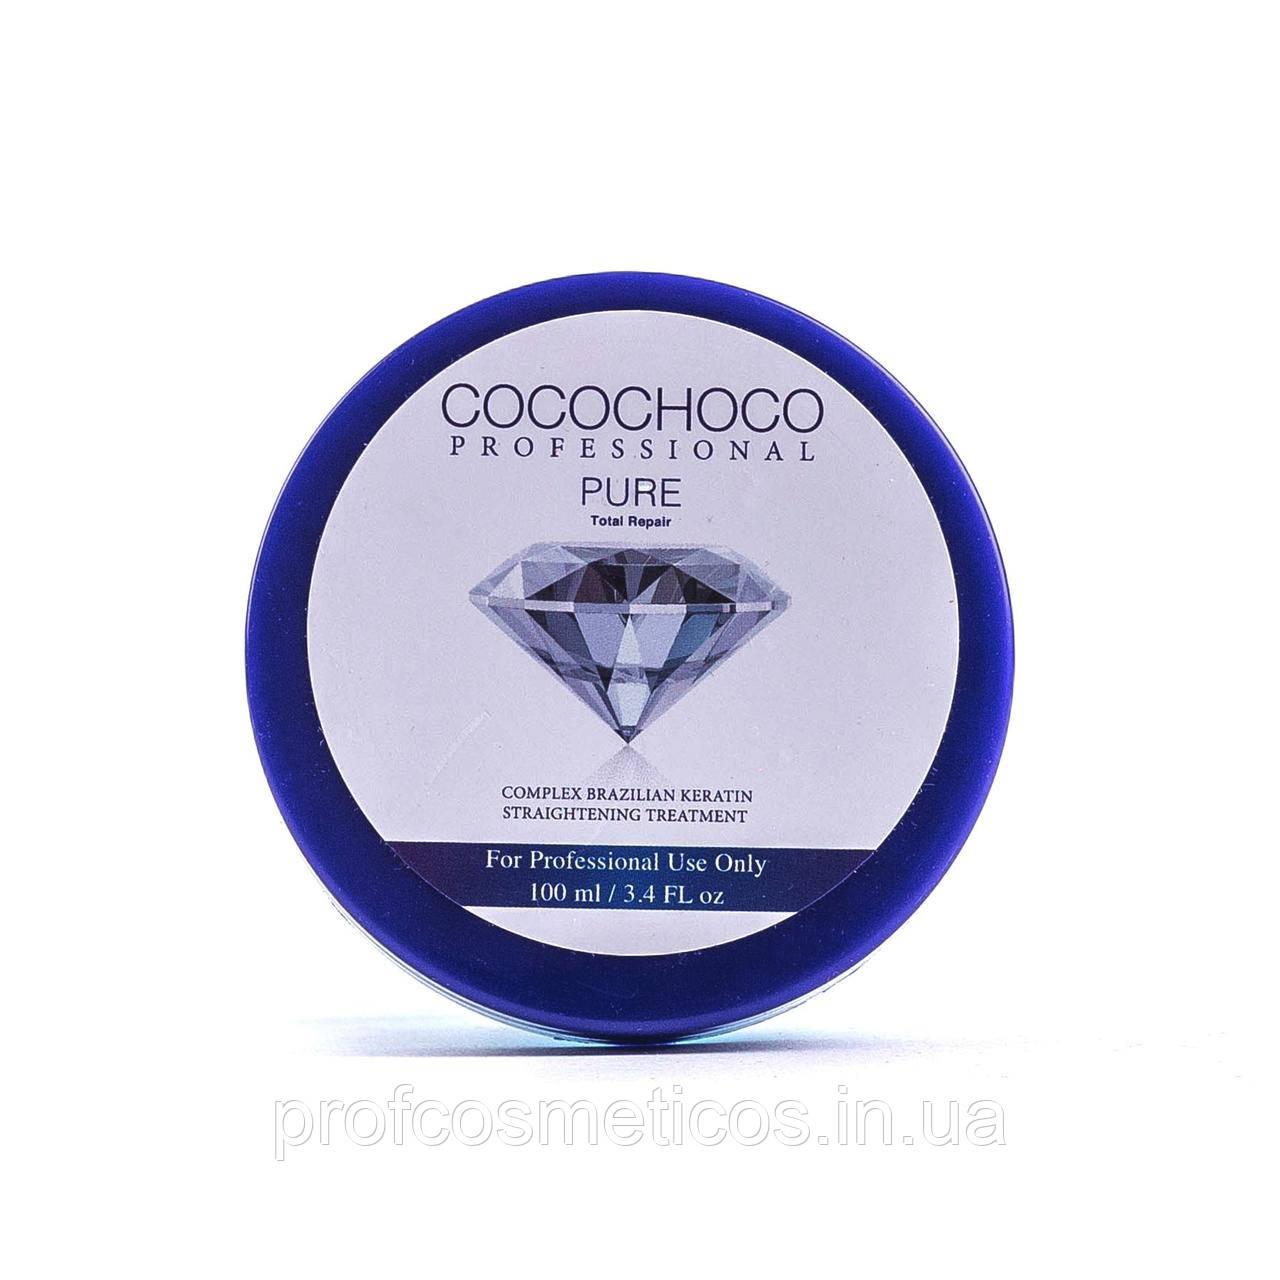 Кератин Cocochoco Pure, 100 мл